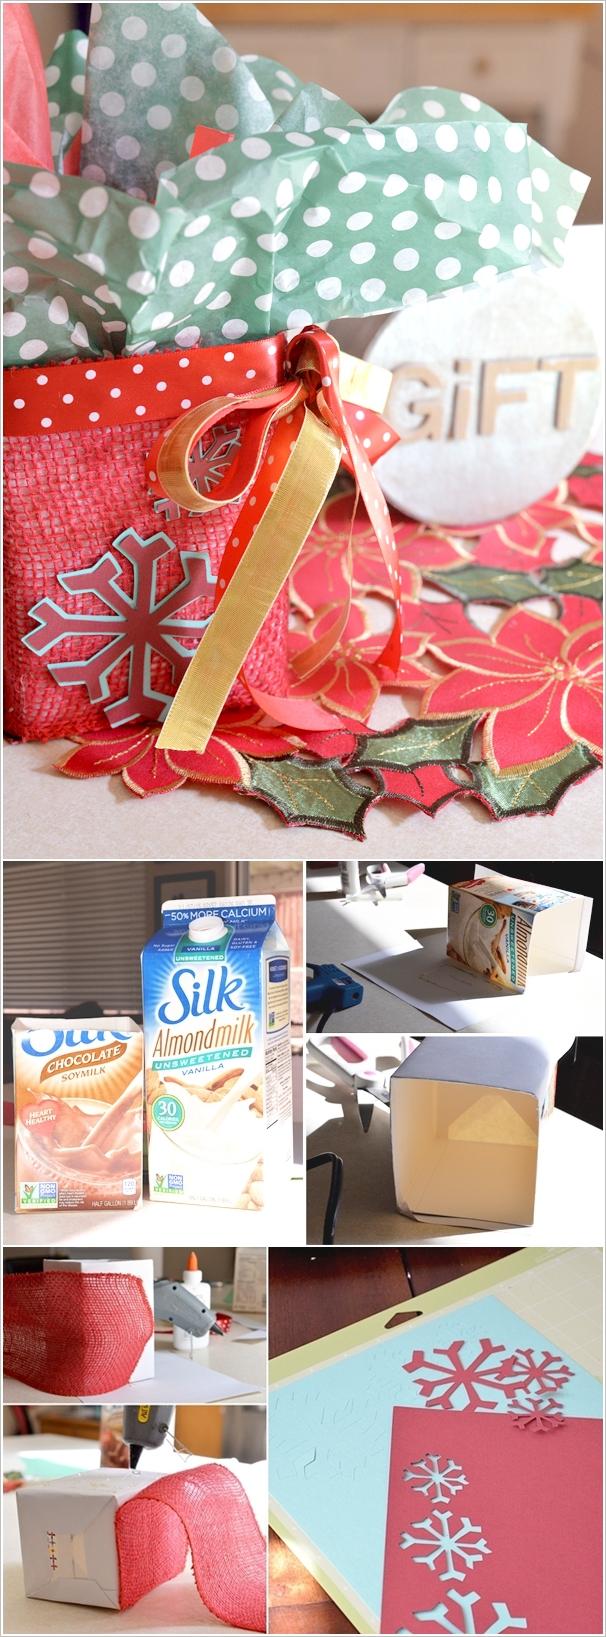 diy ιδέες με χάρτινα κουτιά γάλακτος3